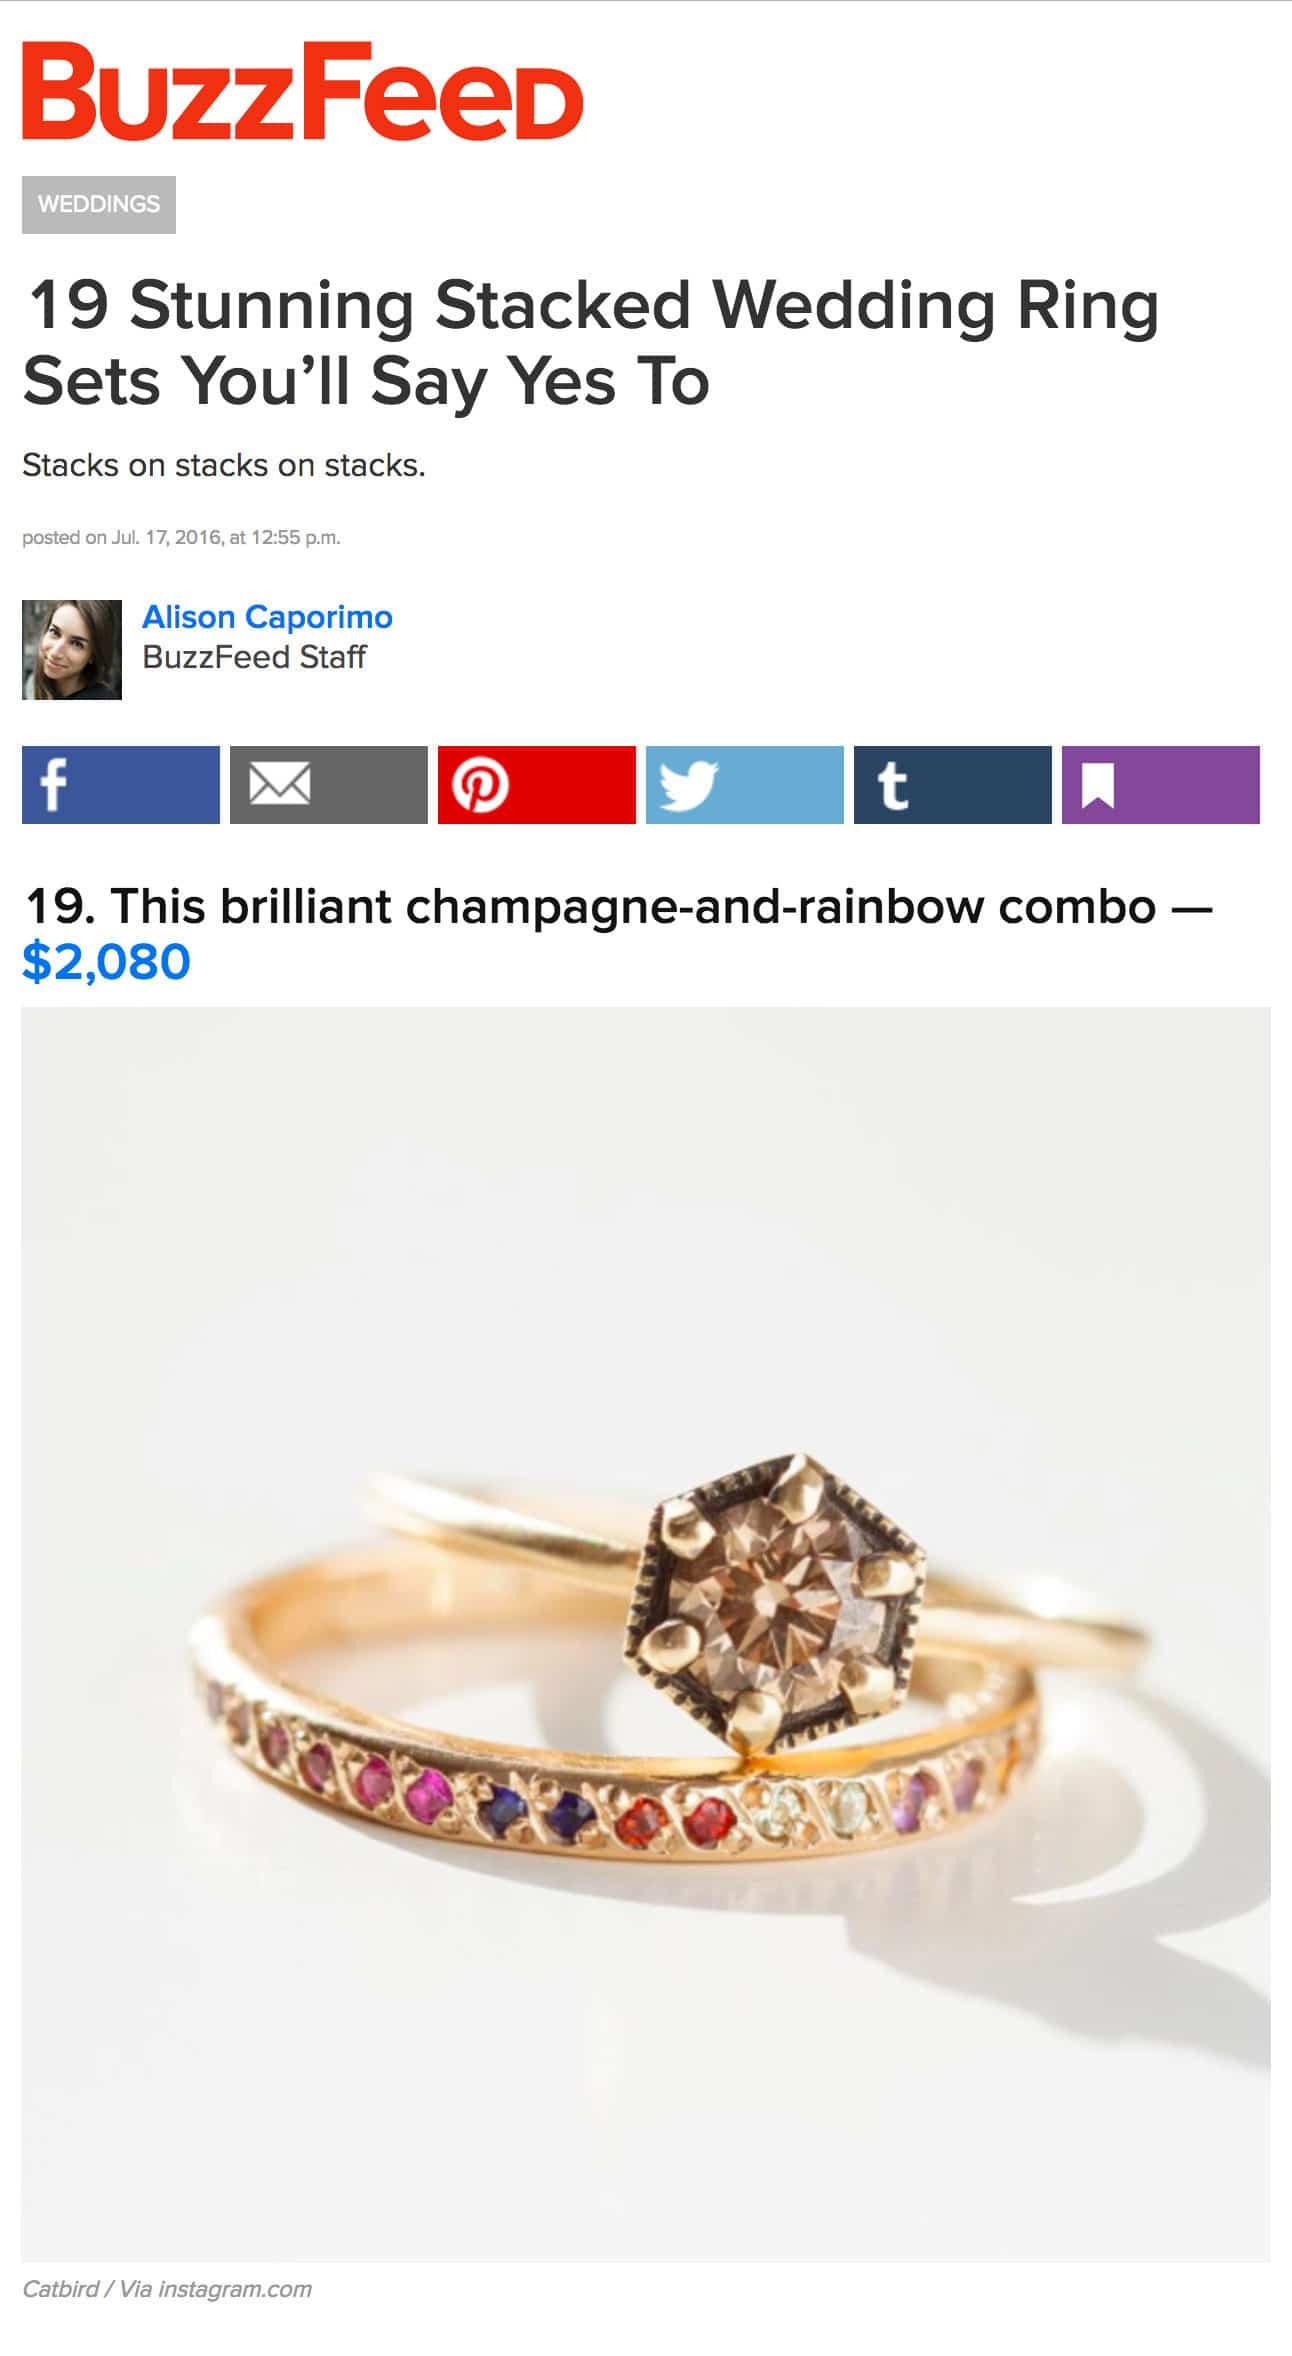 Lovely Wedding Rings Buzzfeed Wedding